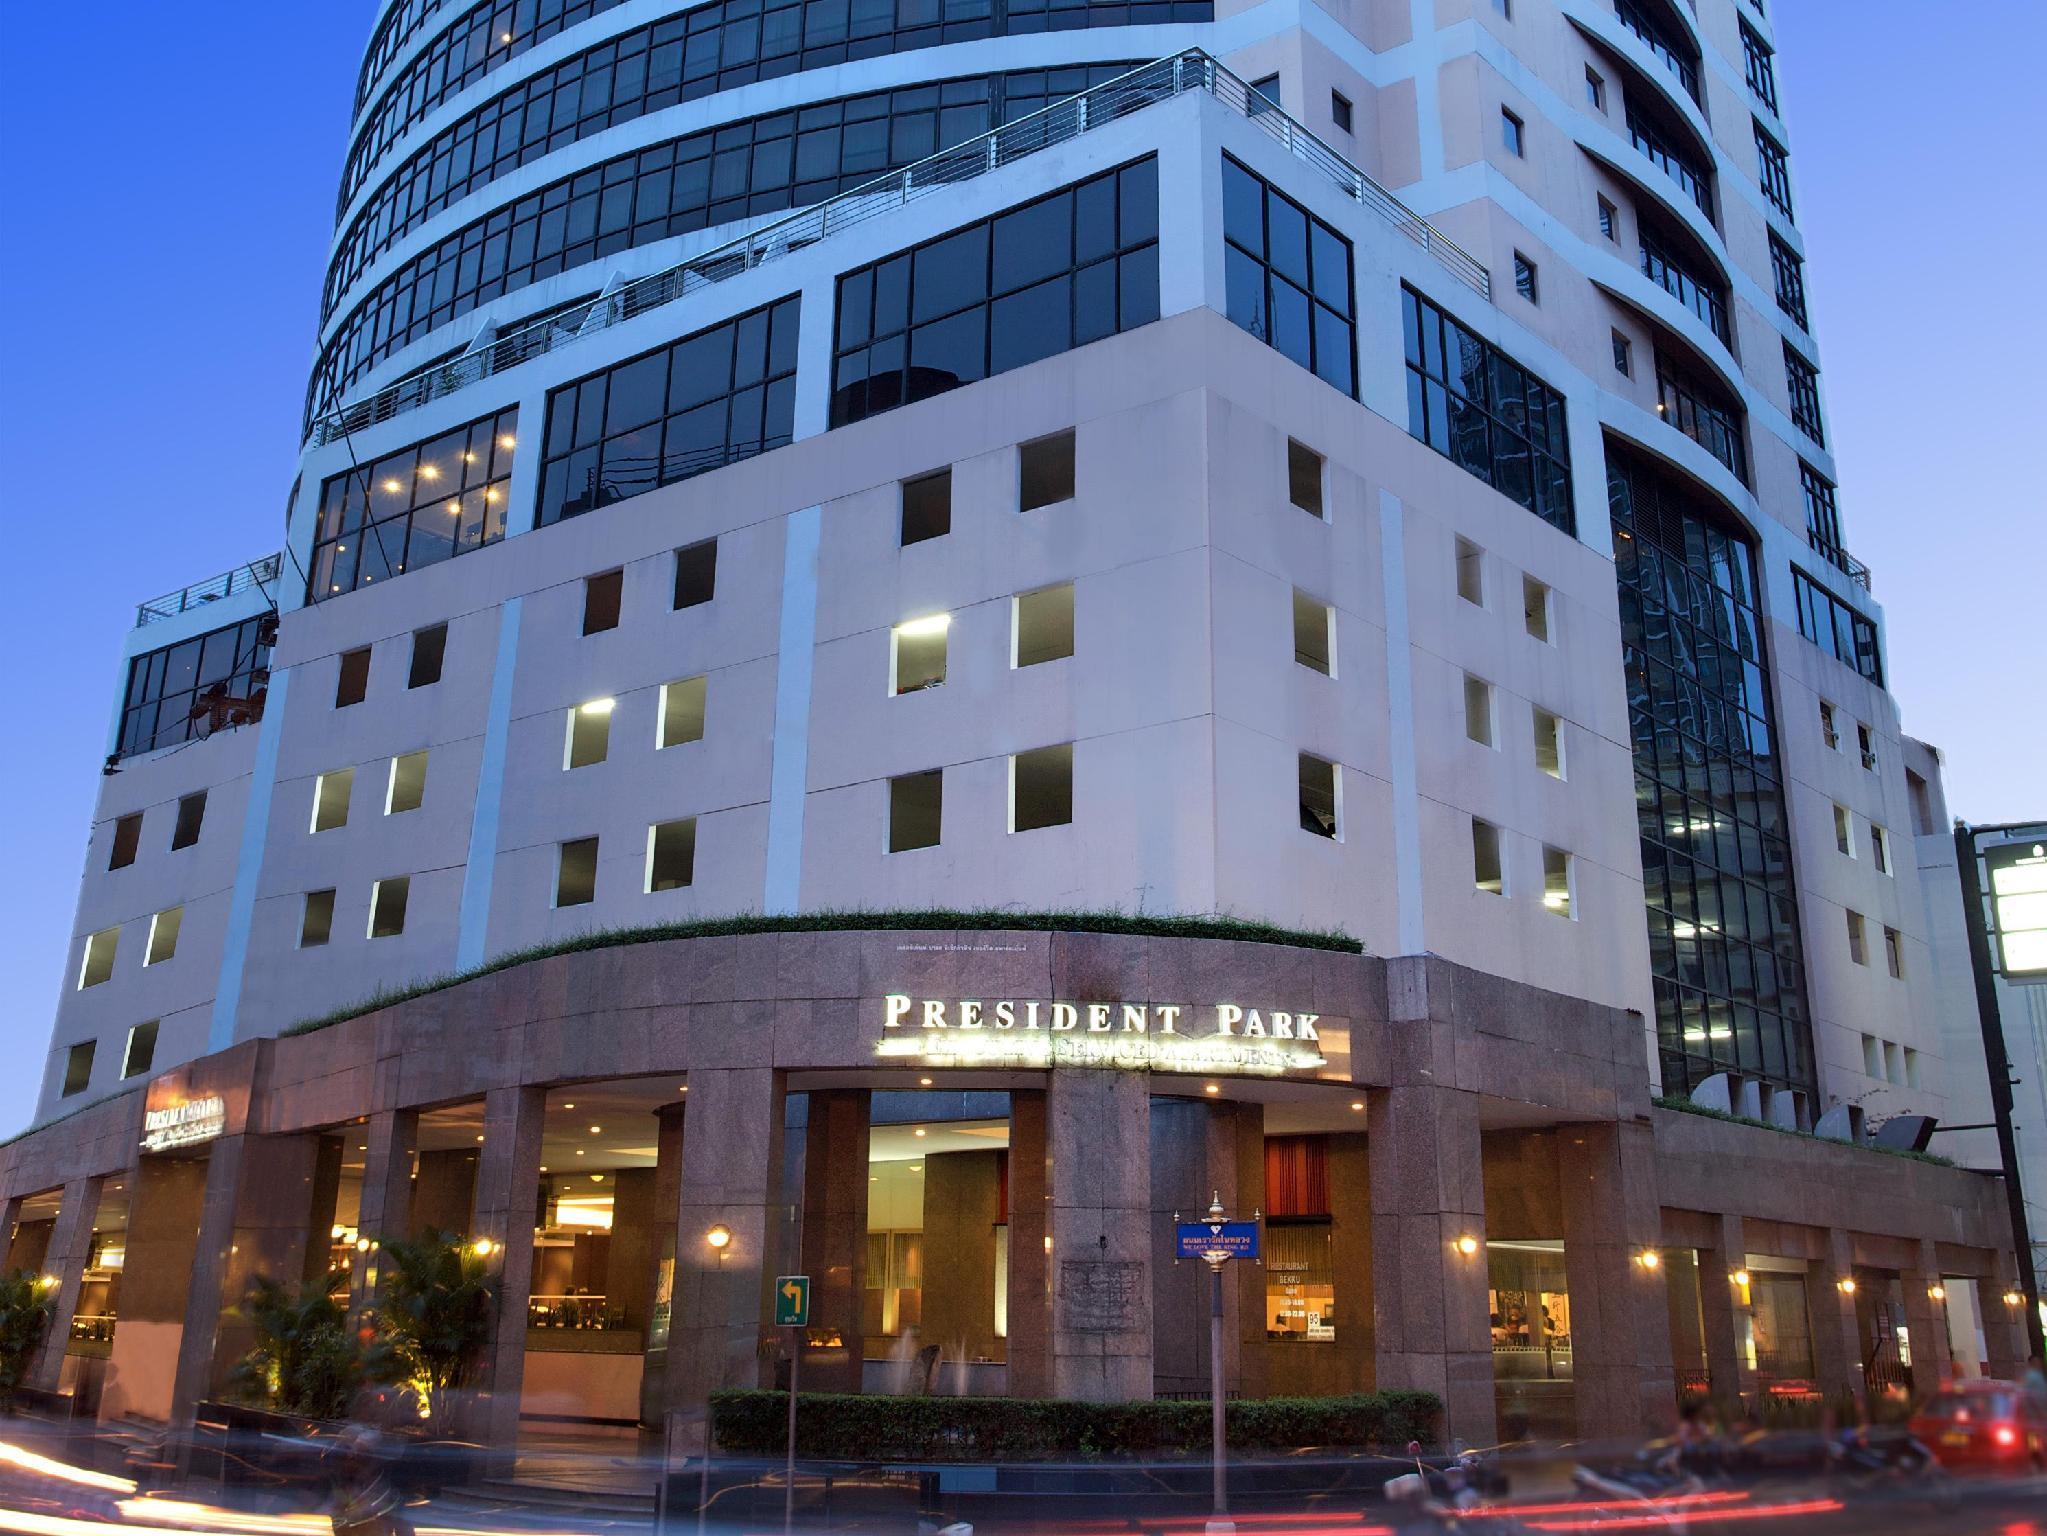 President Park Hotel โรงแรมเพรสซิเดนท์ ปาร์ค